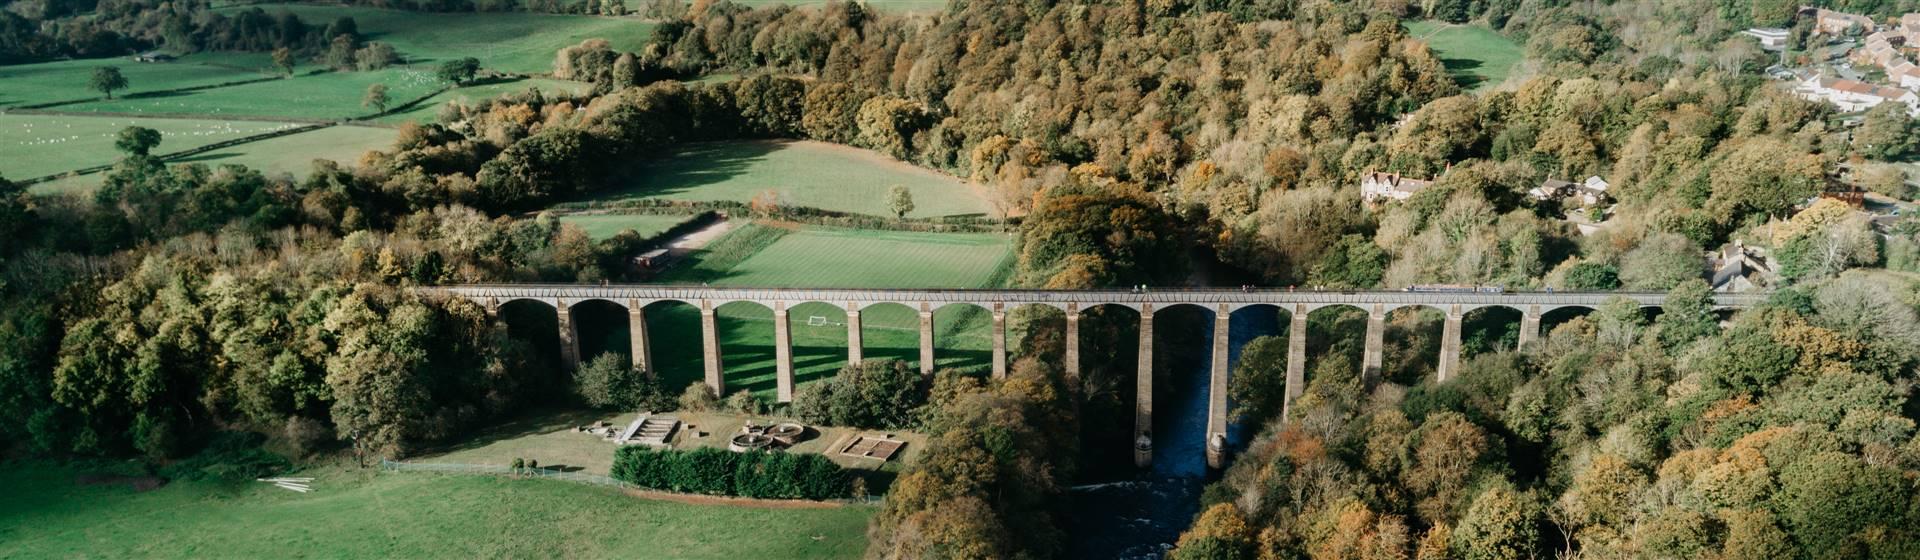 "<img src=""pontcysyllteaqueduct-header-shutterstock_1331859341.jpeg"" alt=""Pontcysyllte Aqueduct""/>"